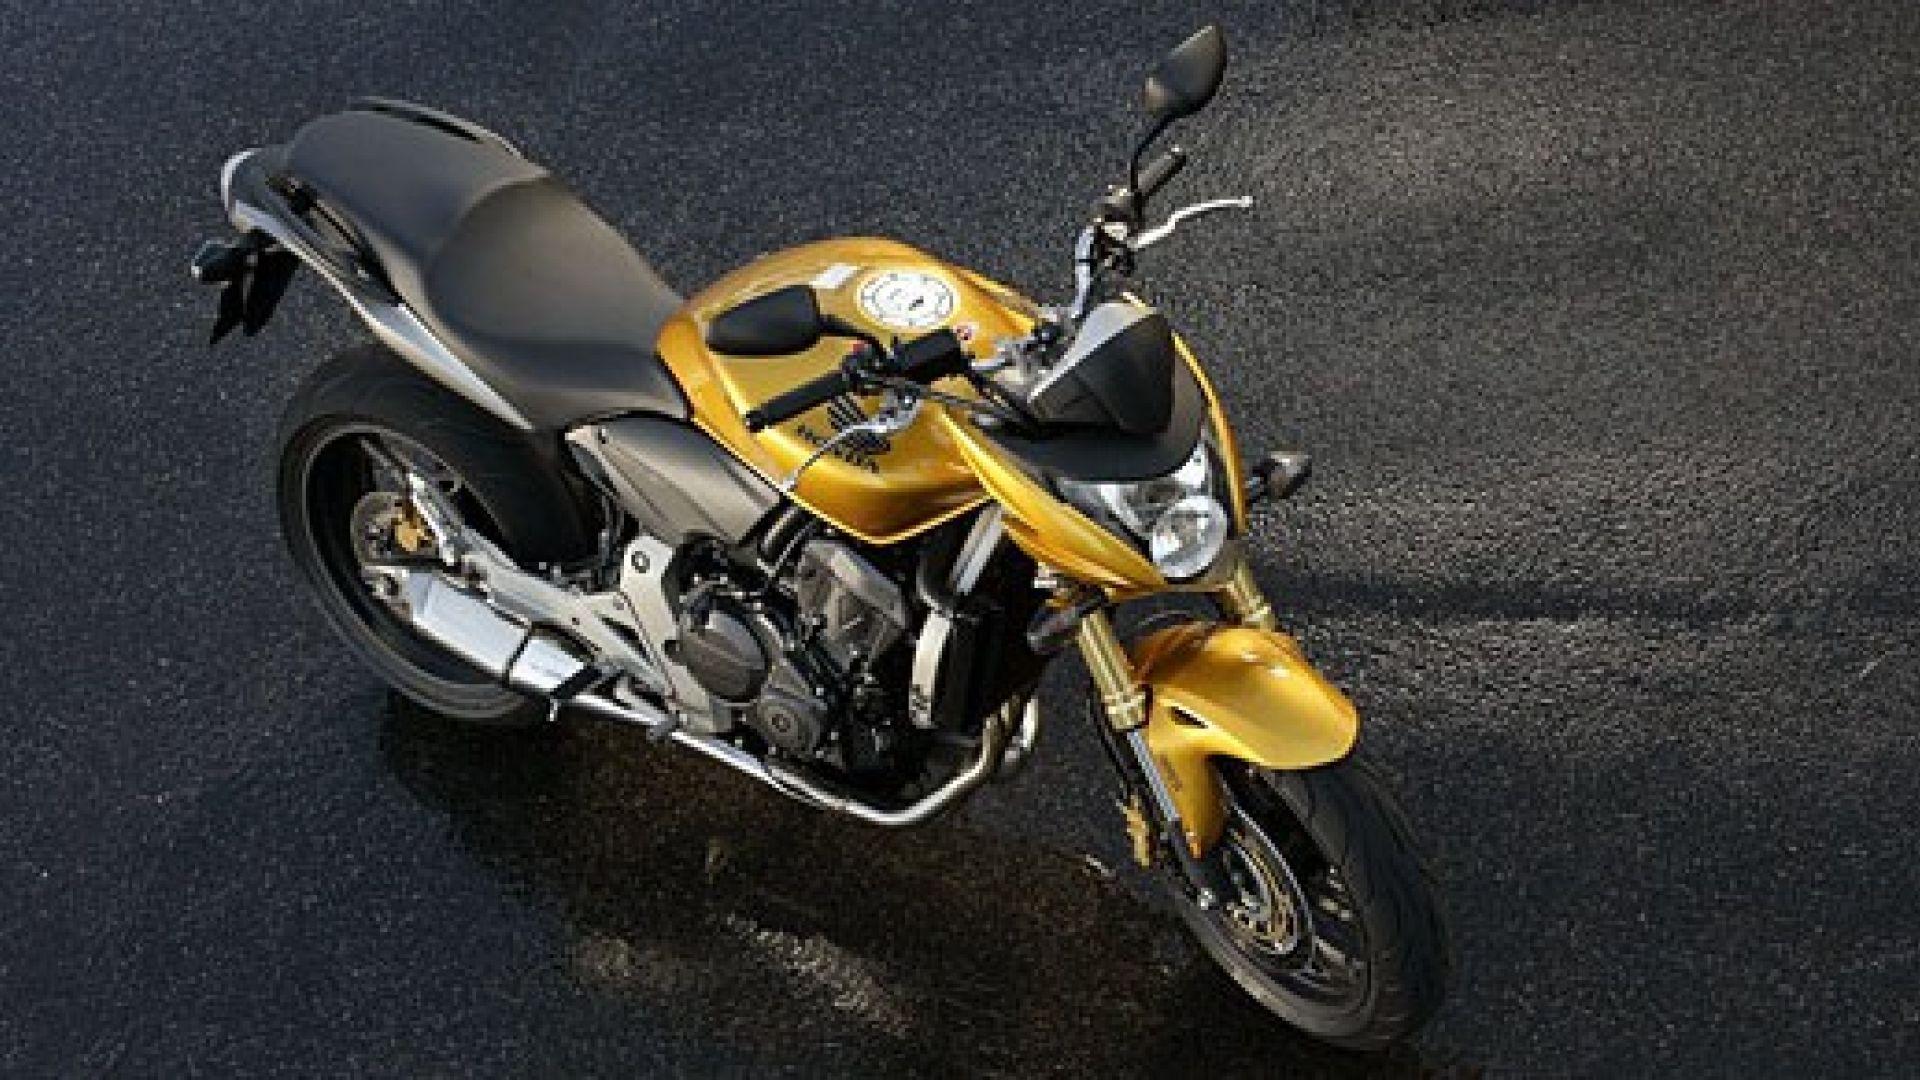 Honda CB 600 Hornet 07-09 - Wemoto